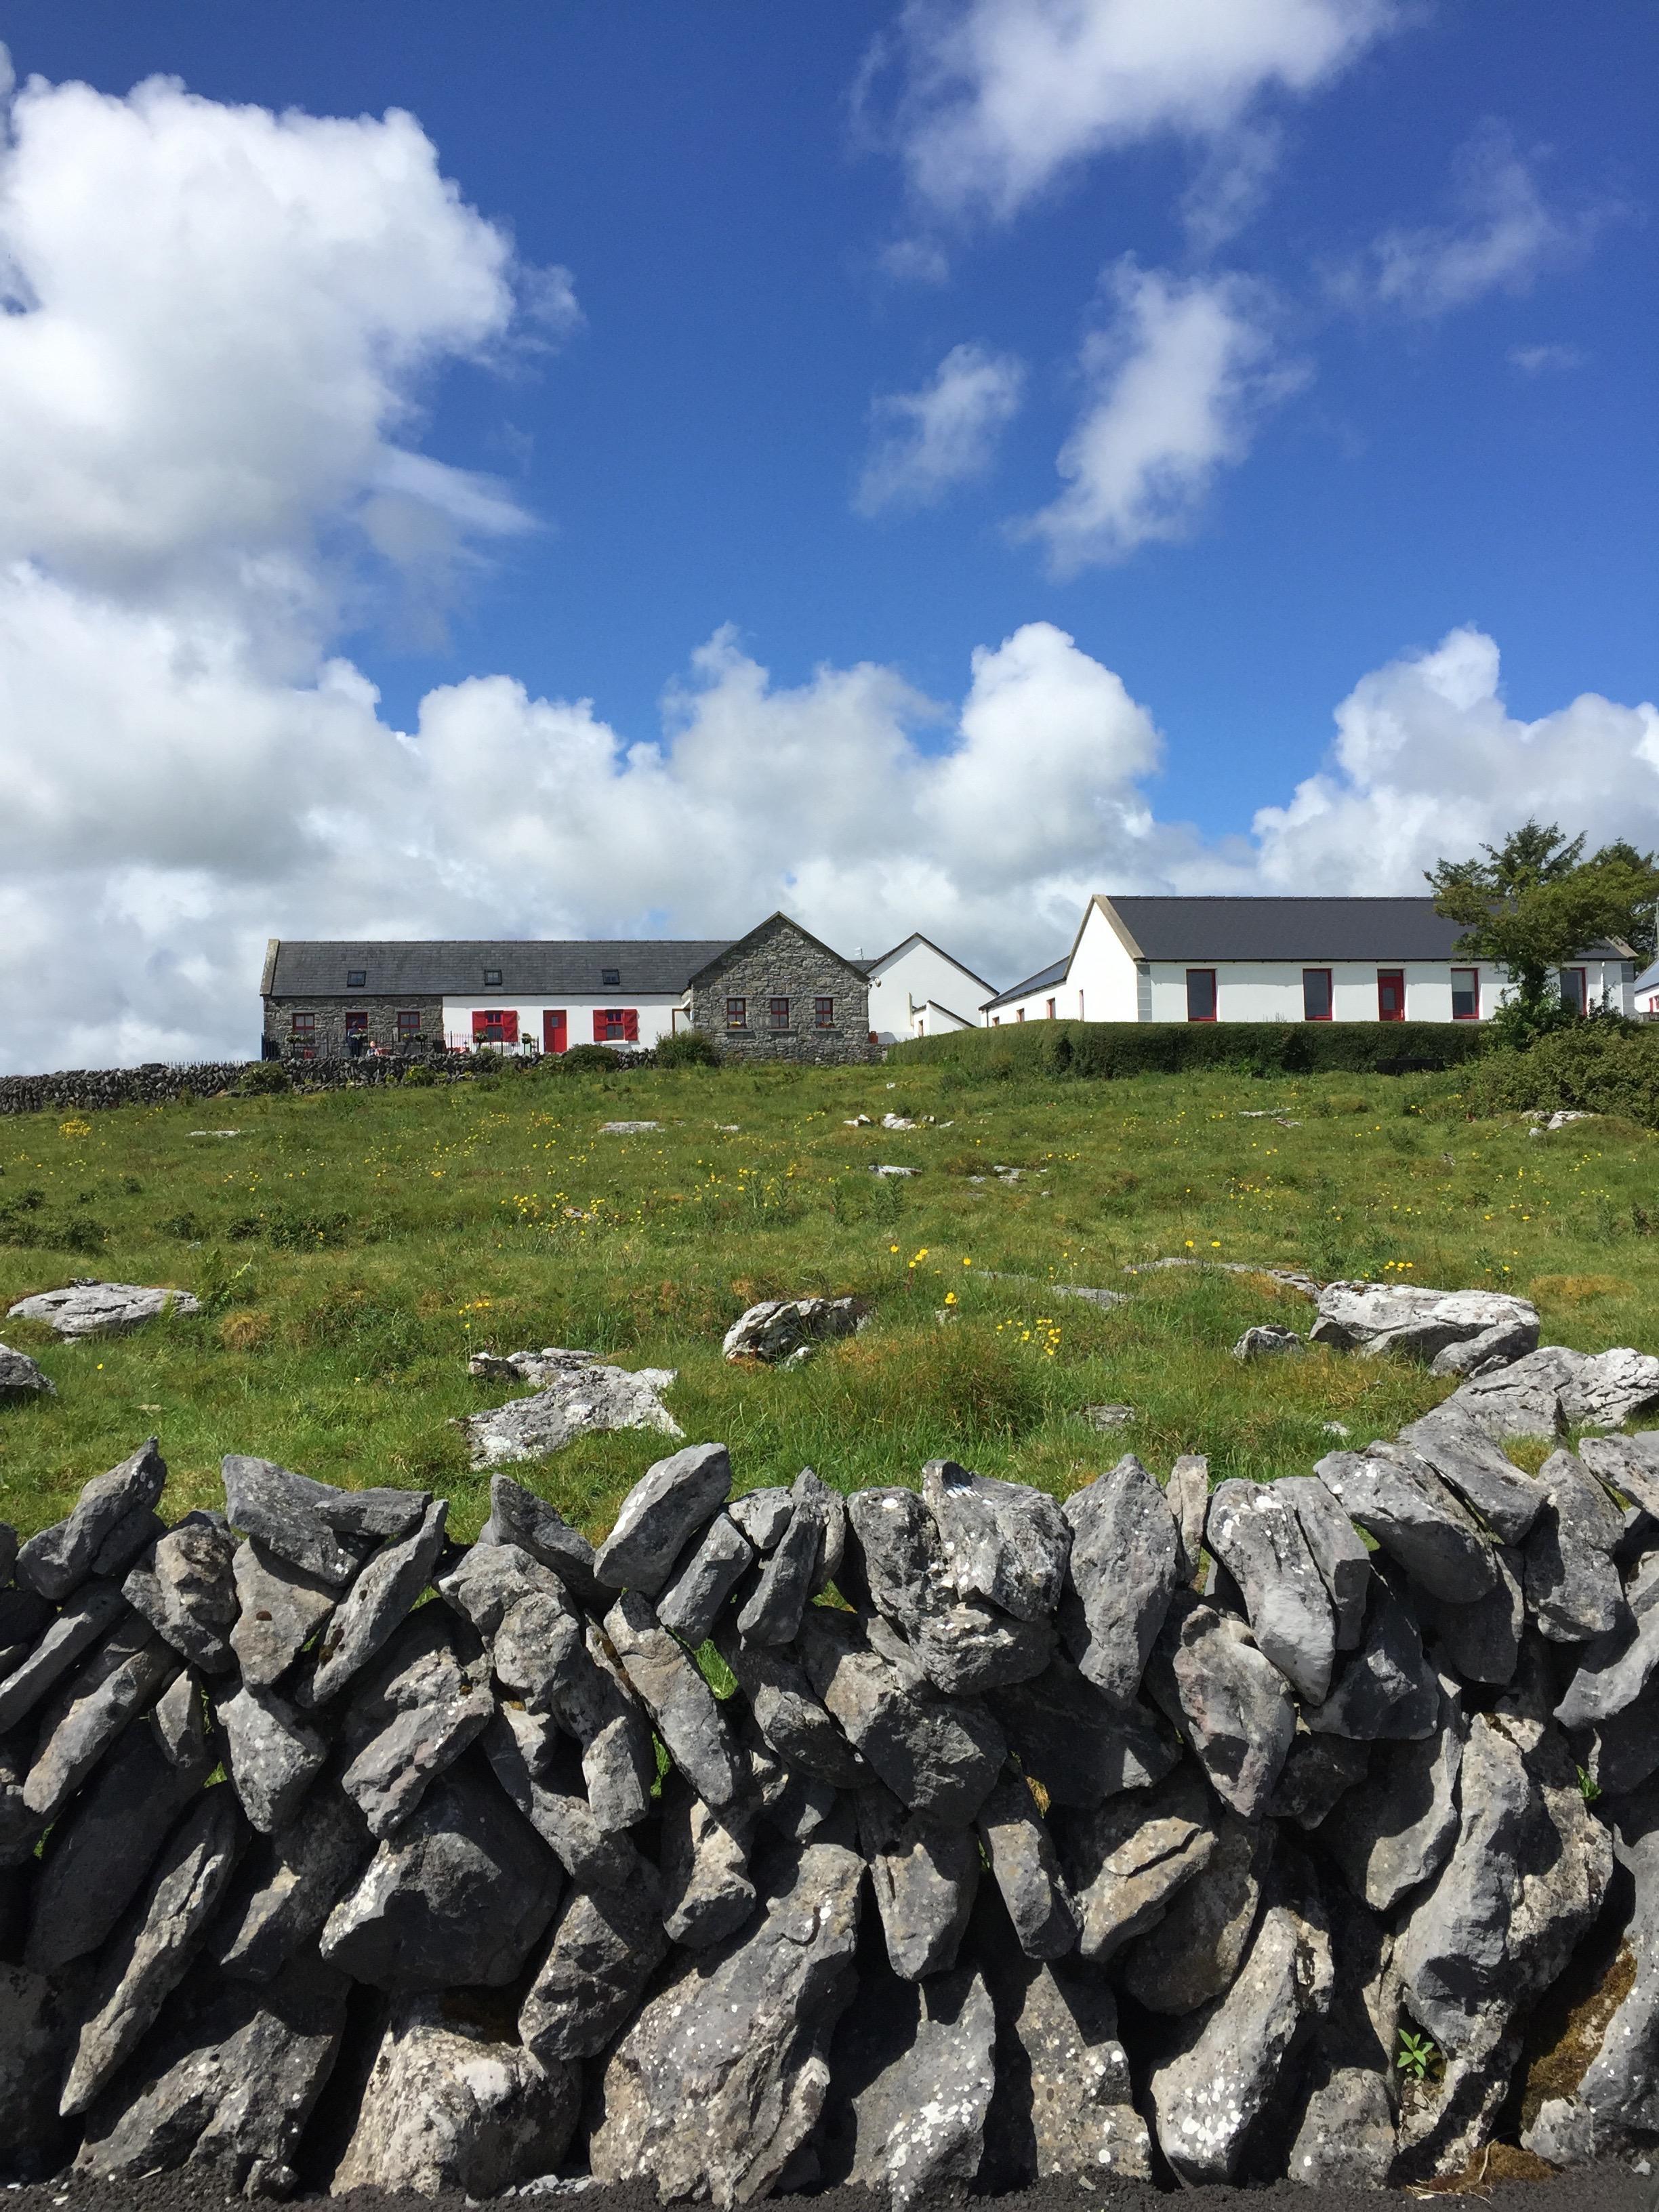 The Burren area